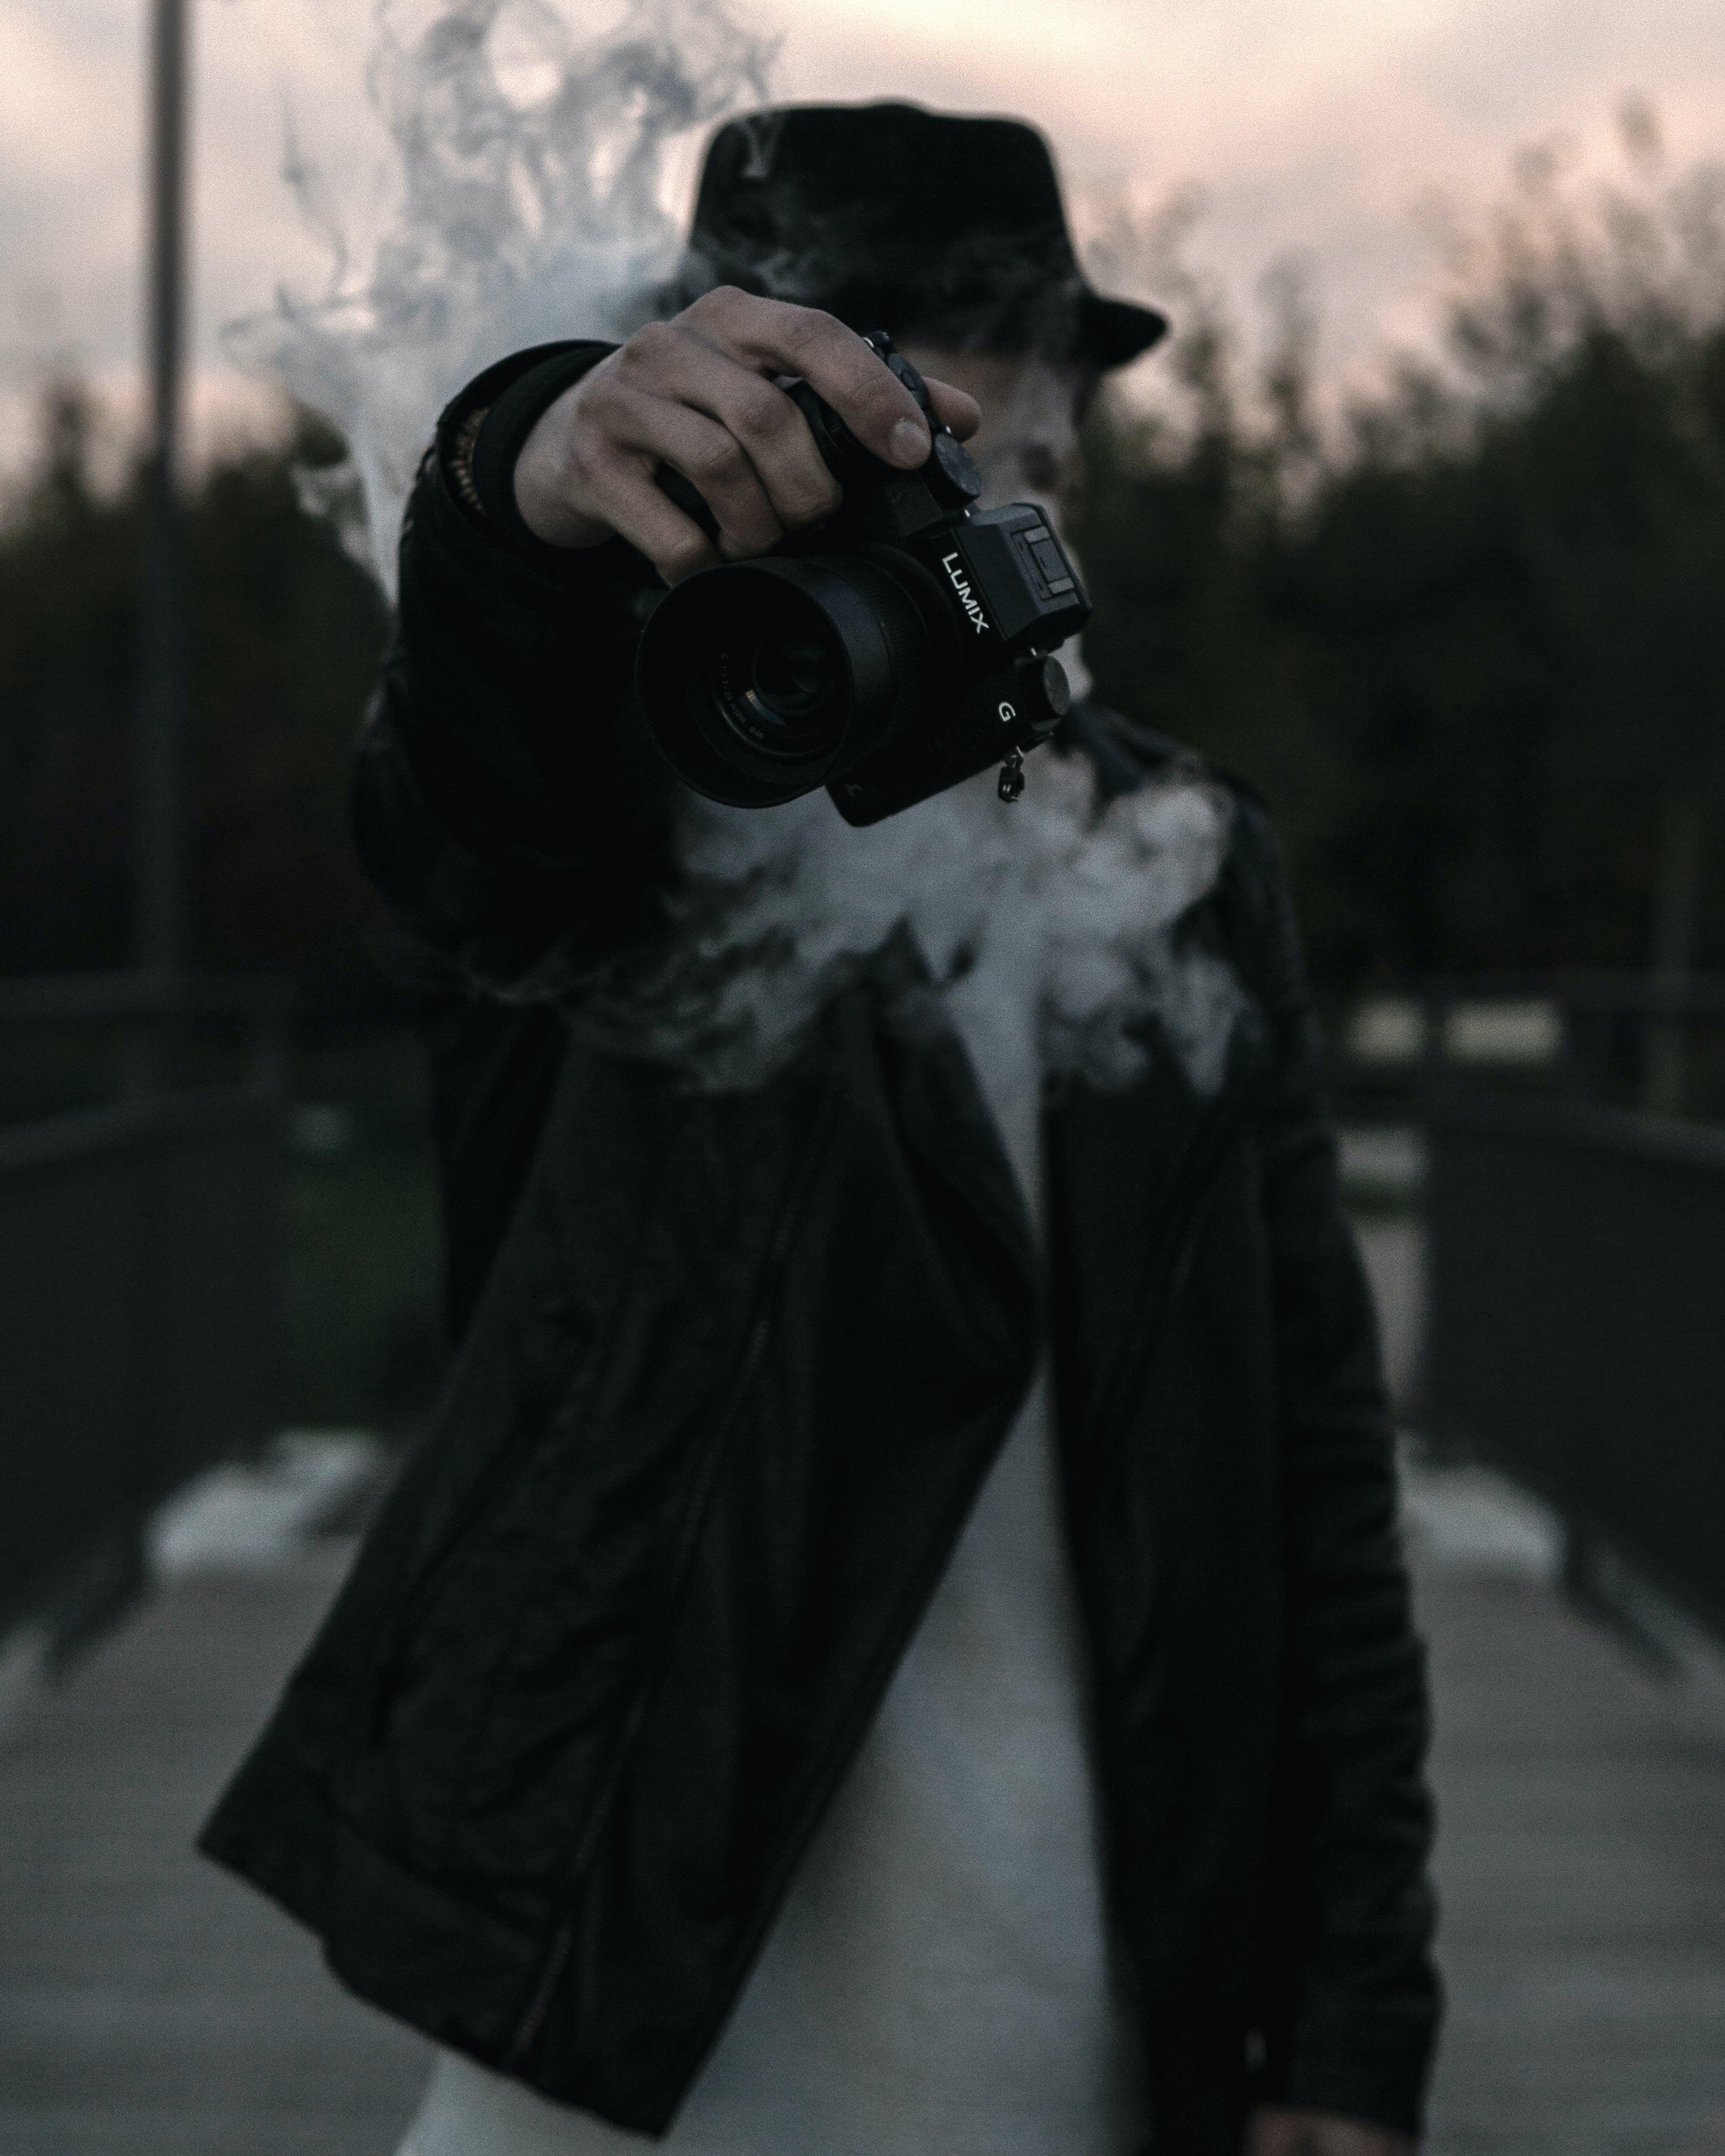 Person Black Holding Lumix Dslr Camera